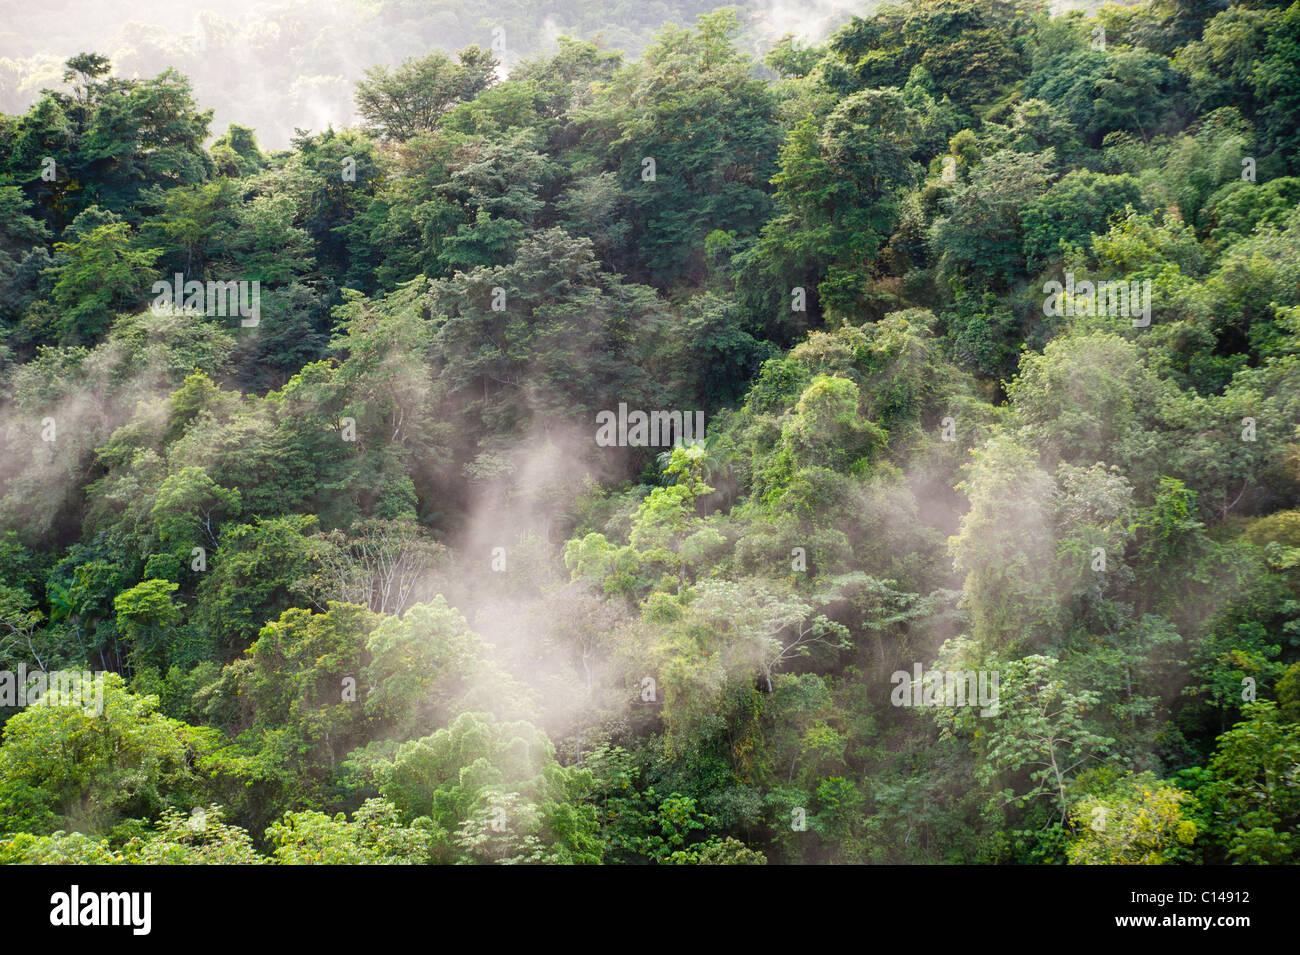 Amazonas-Regenwald, Dschungel, Nebel, Wipfel, Stockbild